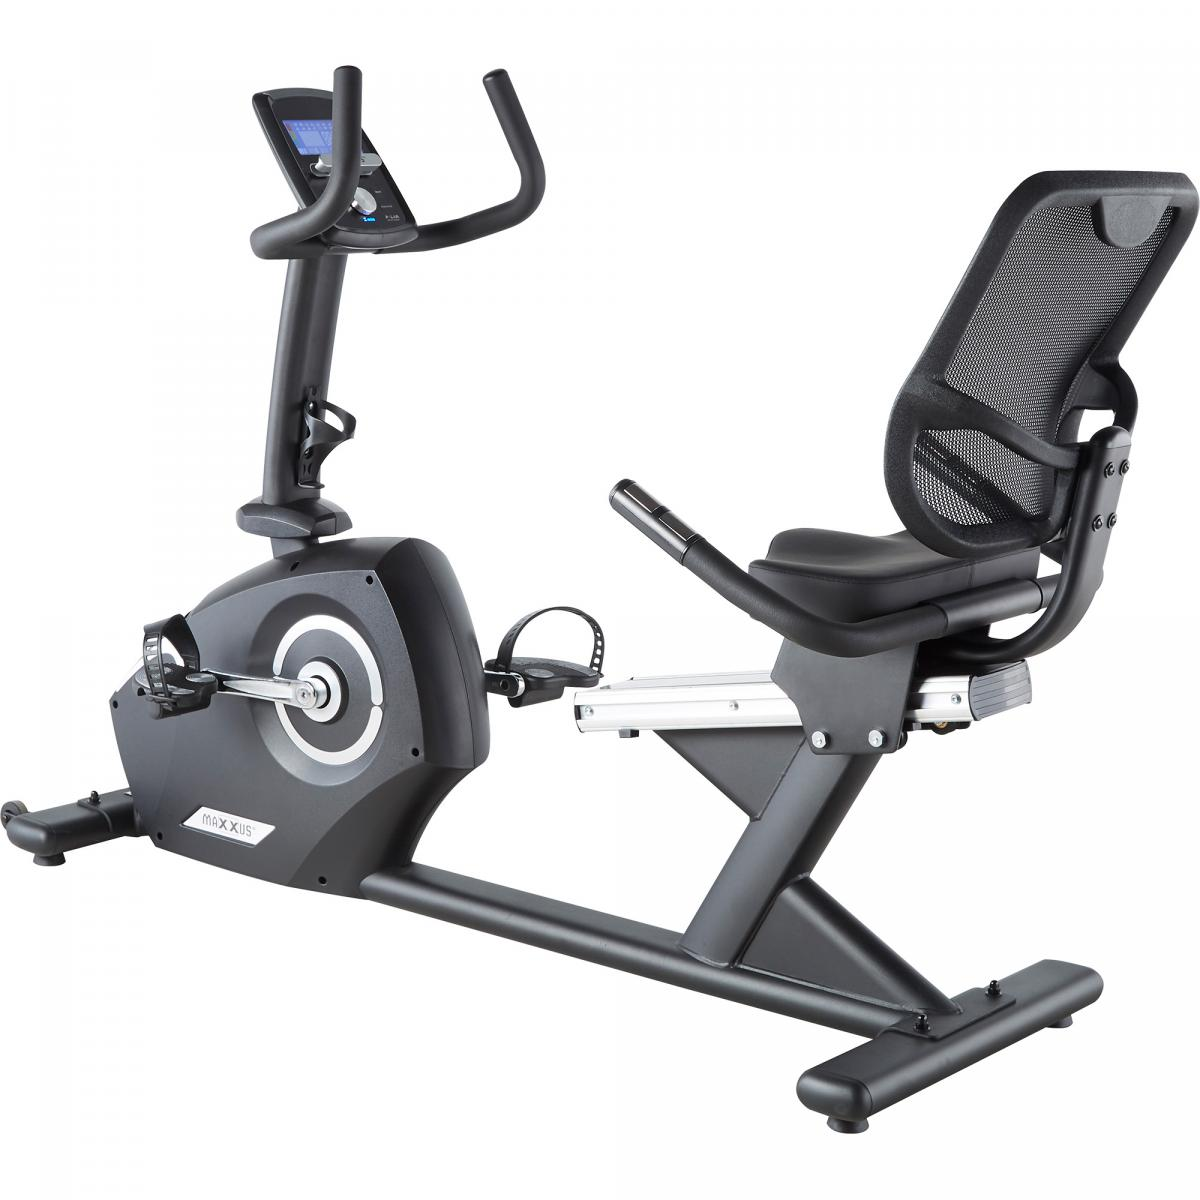 MAXXUS Recumbent Ergometer Bike 4.2R MX-600013-00019-0001